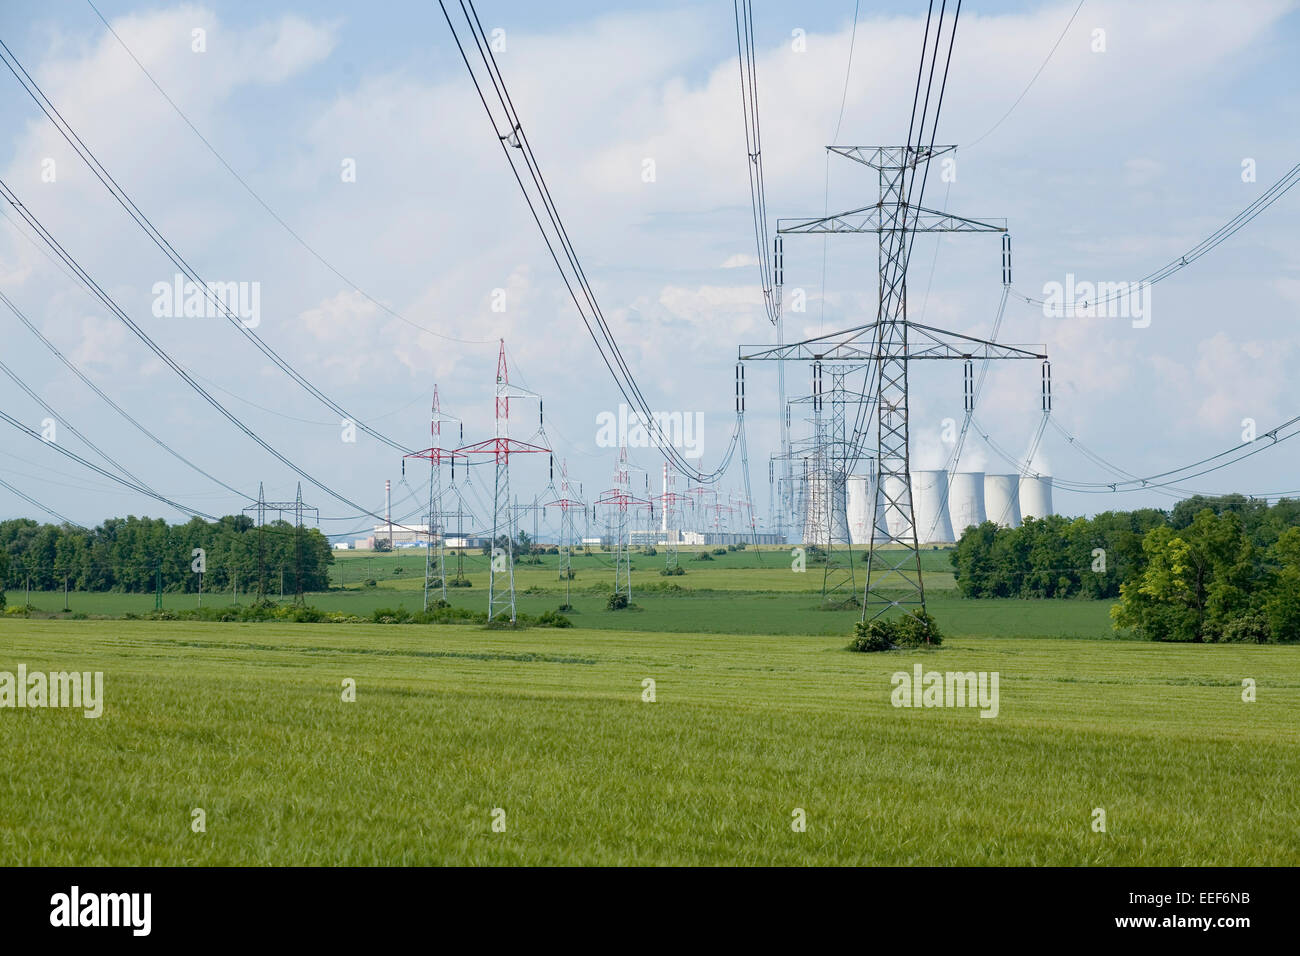 Kraftwerk, Kuehlturm, Detail, Rauch, Kernkraftwerk, Atomkraftwerk, Wirtschaft, Energie, Energiegewinnung, Energieversorgung, - Stock Image